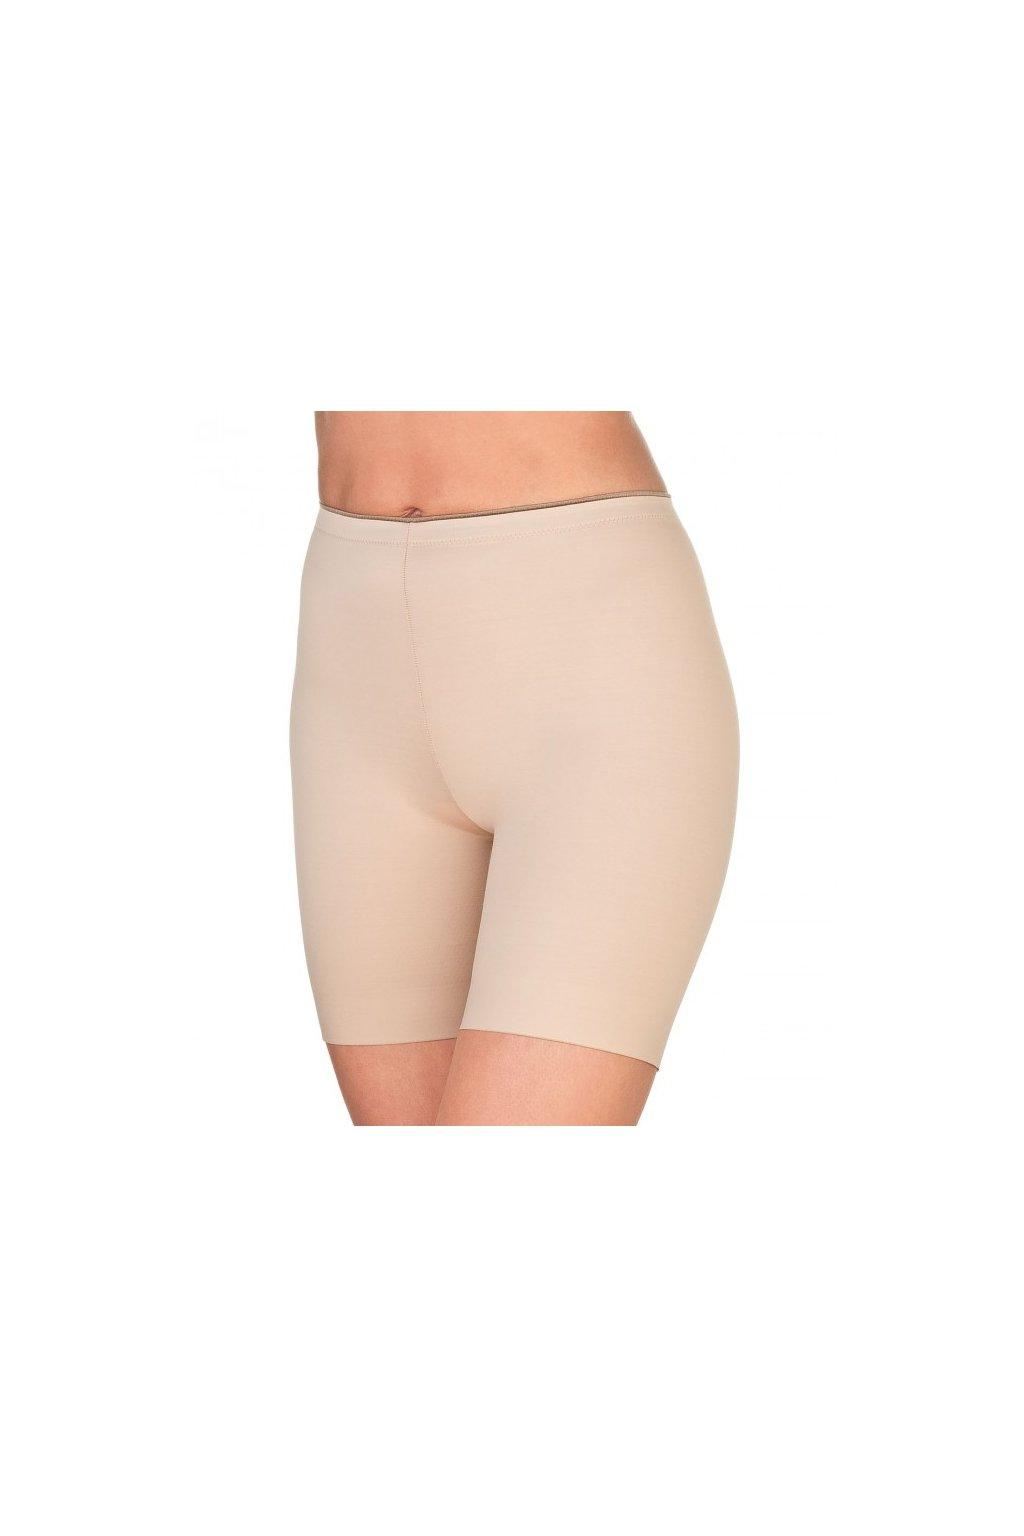 Nohavičky zoštíhľujúce Felina Soft Touch 88122 x